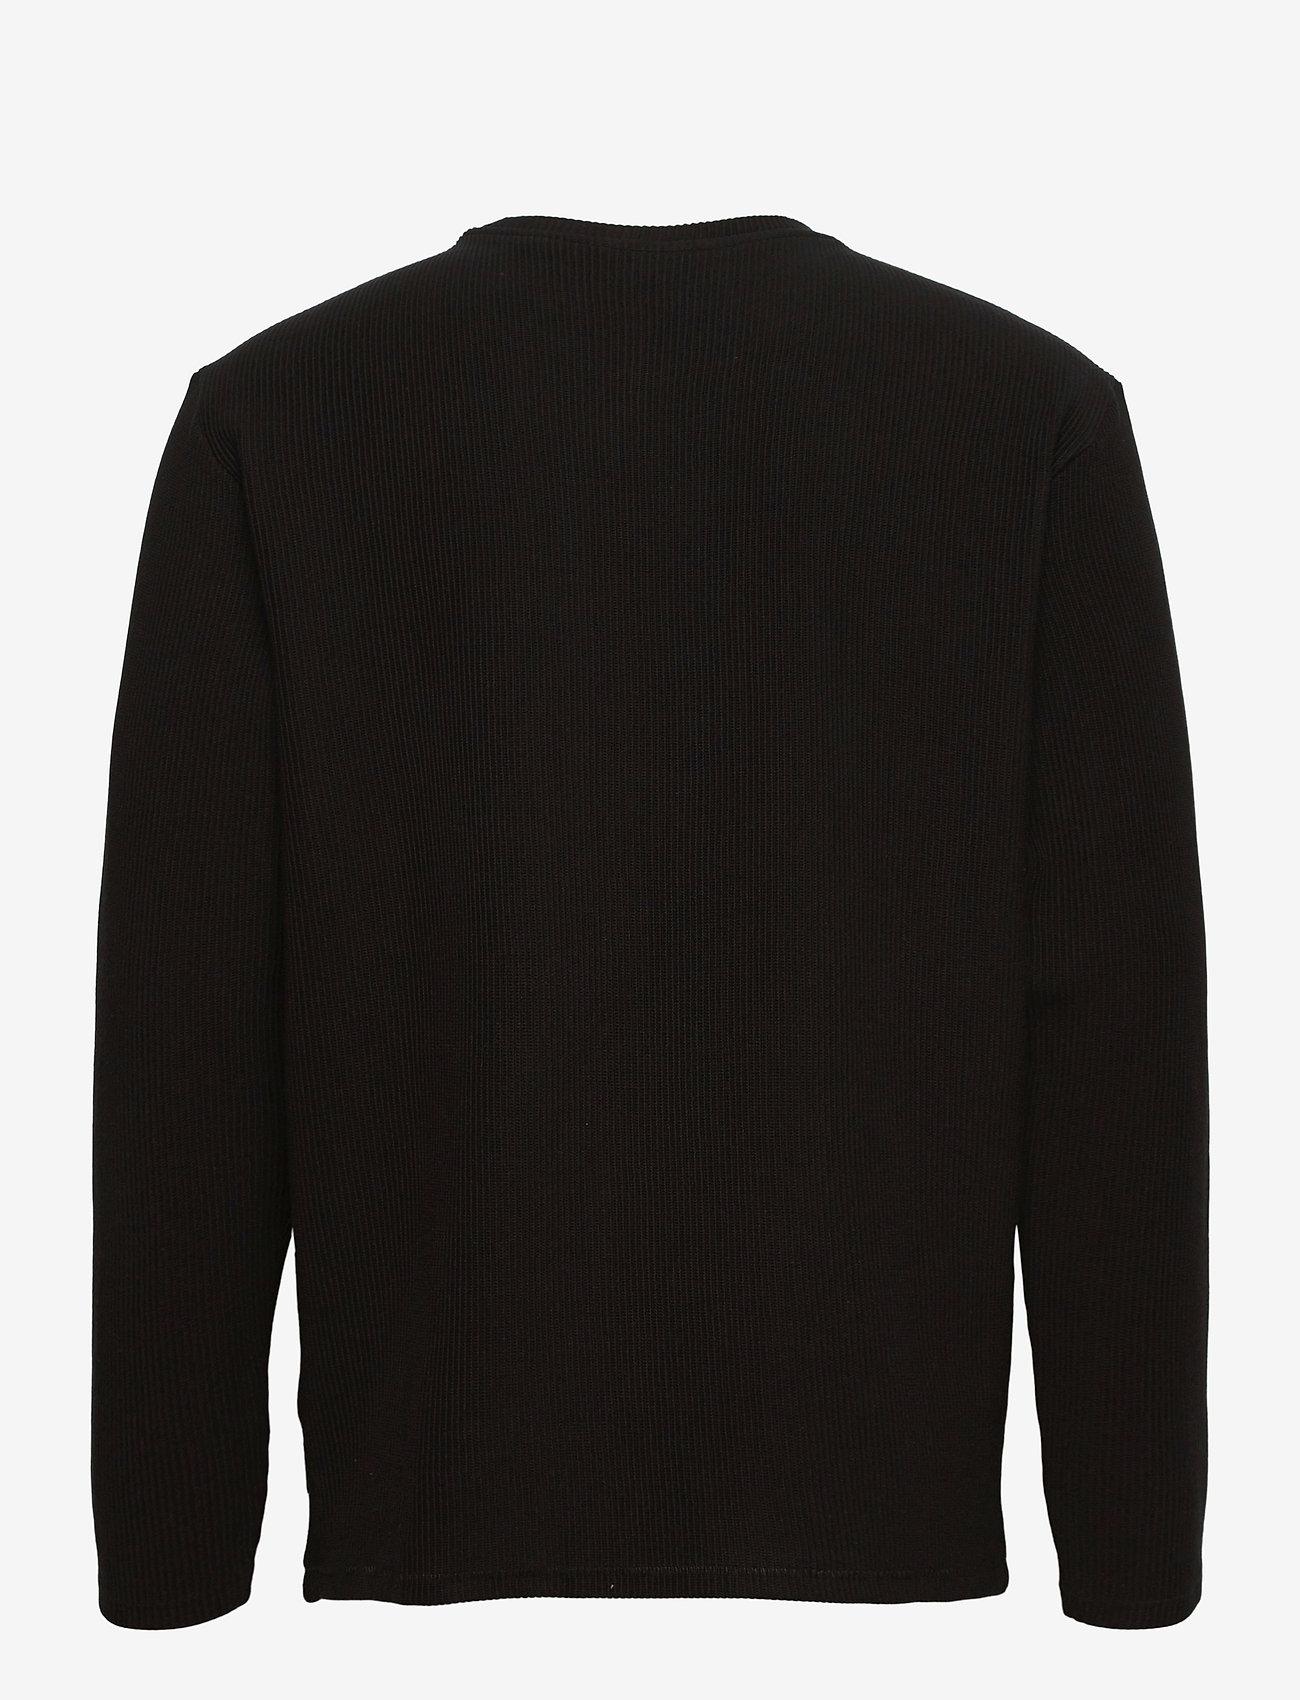 ONLY & SONS - ONSBERKELEY LIFE REG CREW NECK SWEAT - swetry - black - 1